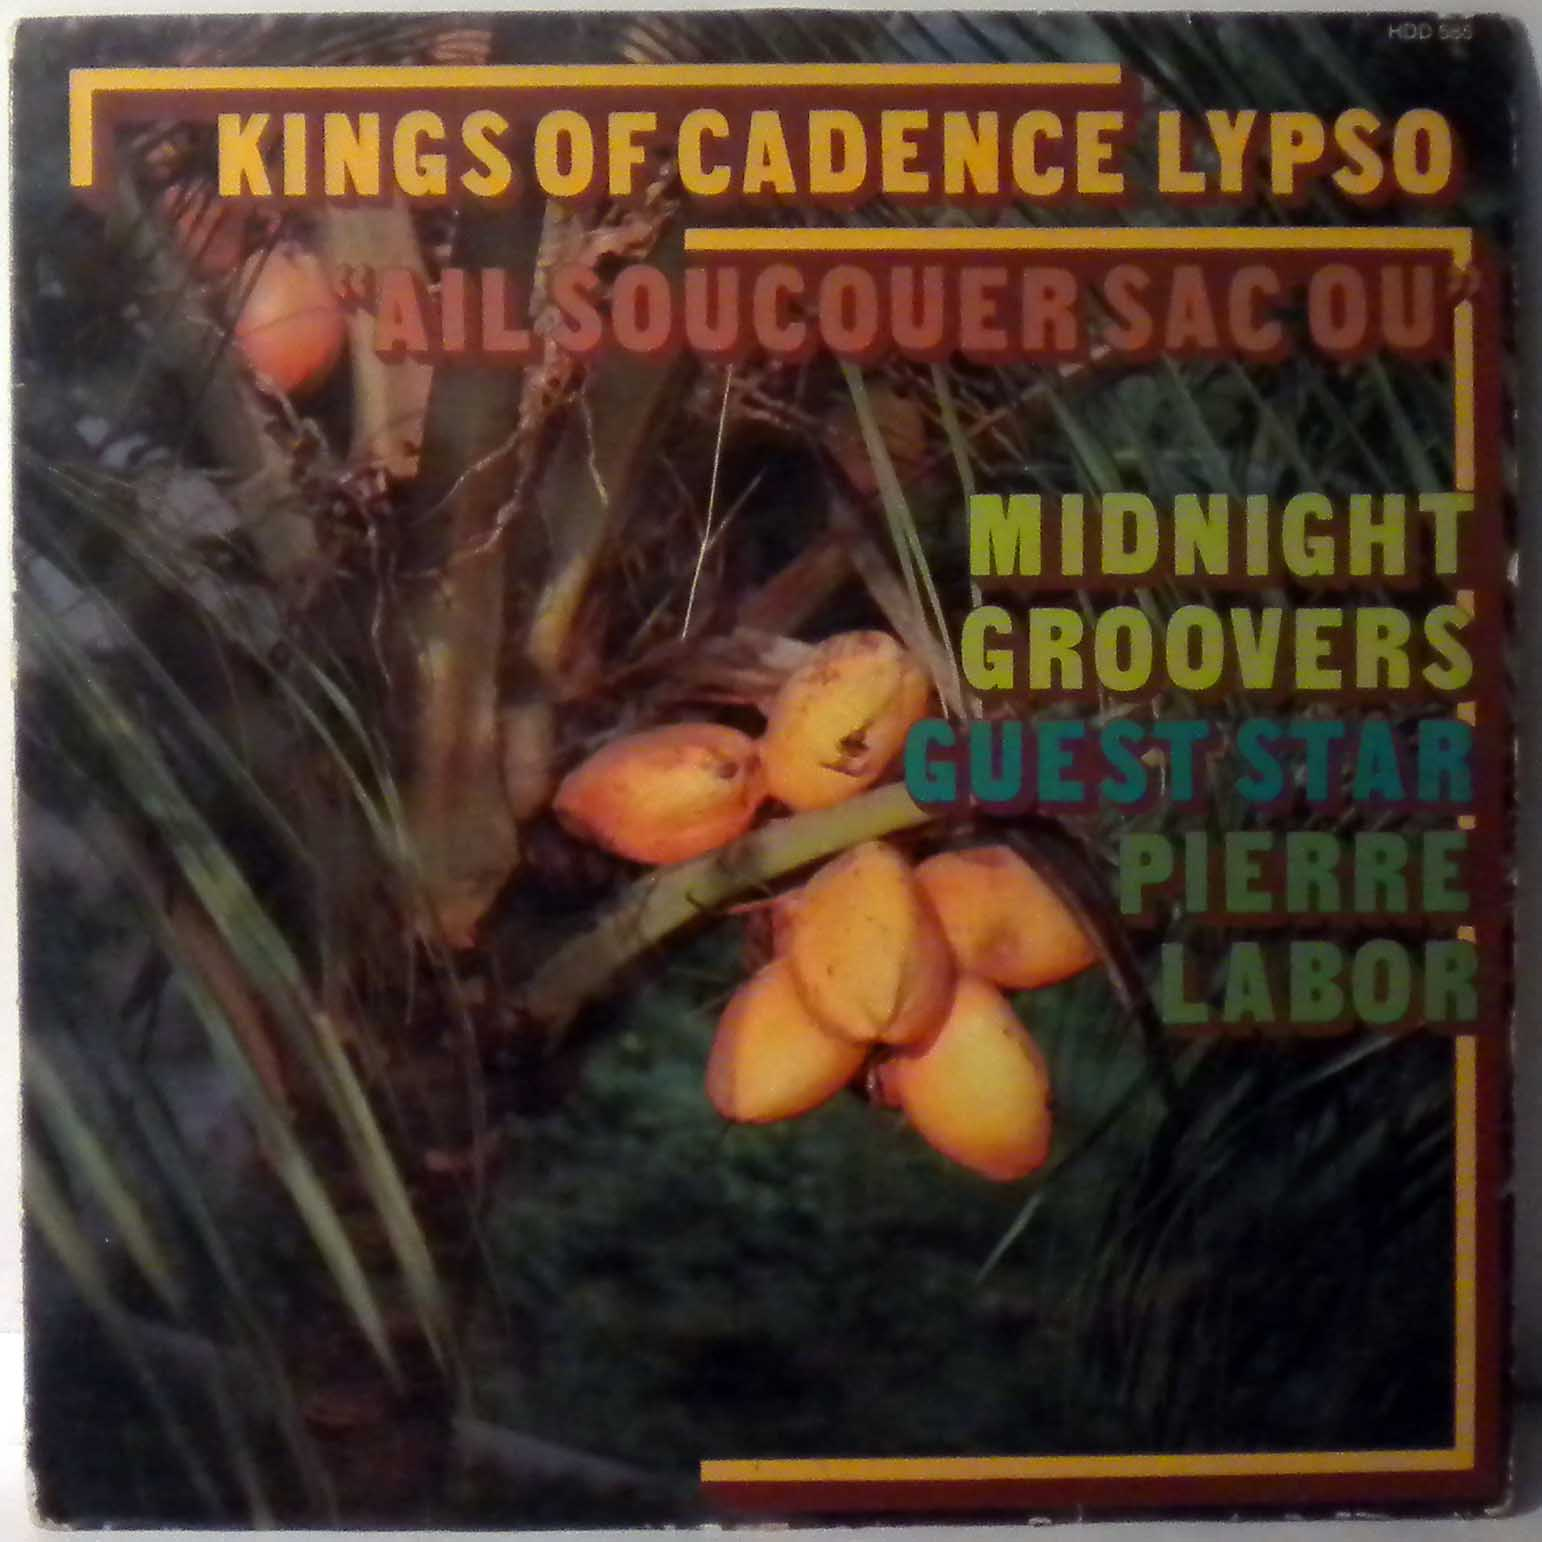 MIDNIGHT GROOVERS - Kings of Cadence Lypso - LP